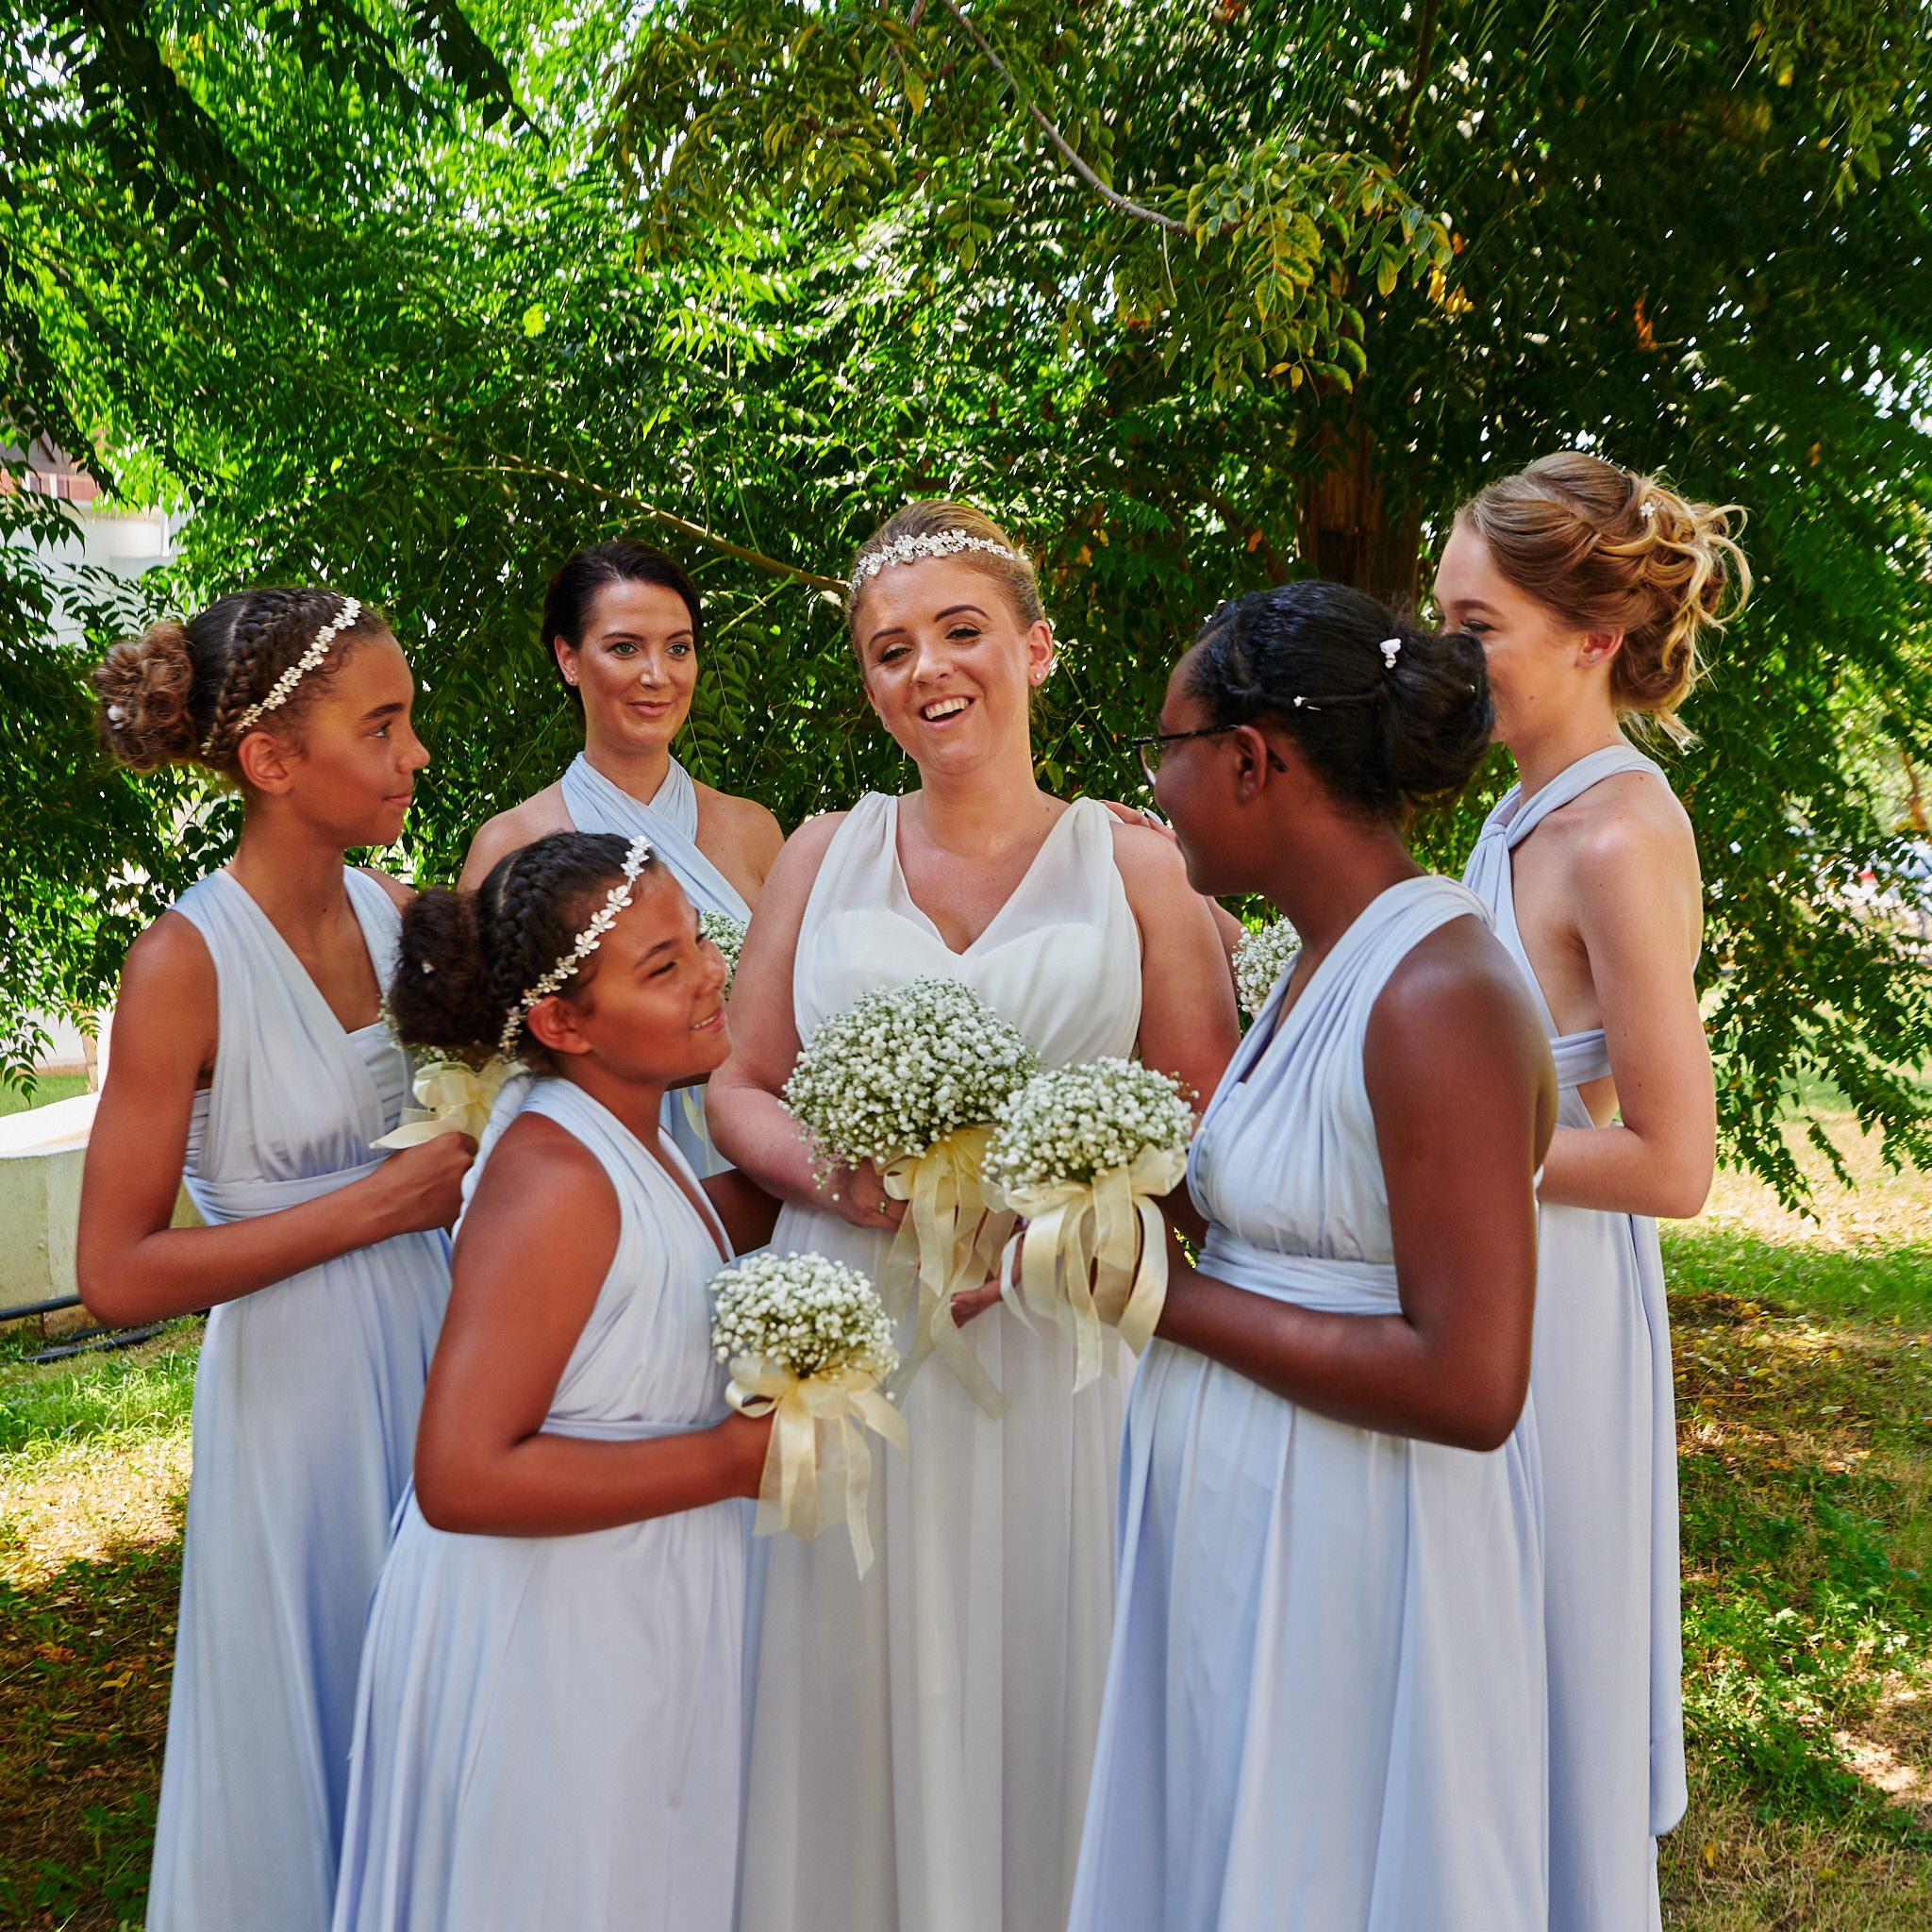 A cuddle of Bridesmaids